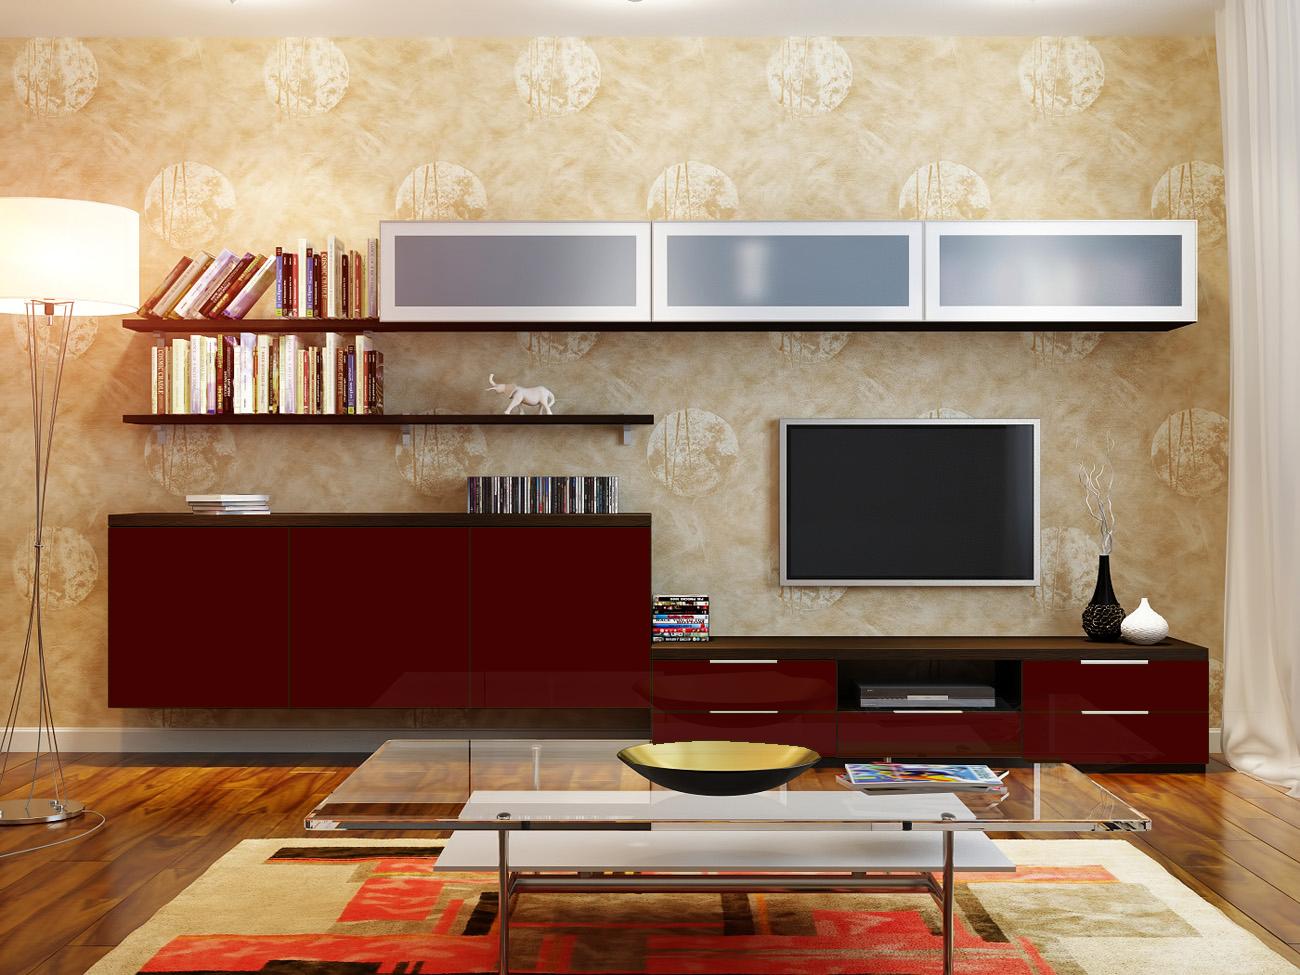 Стенки в стиле модерн мебель фарт.